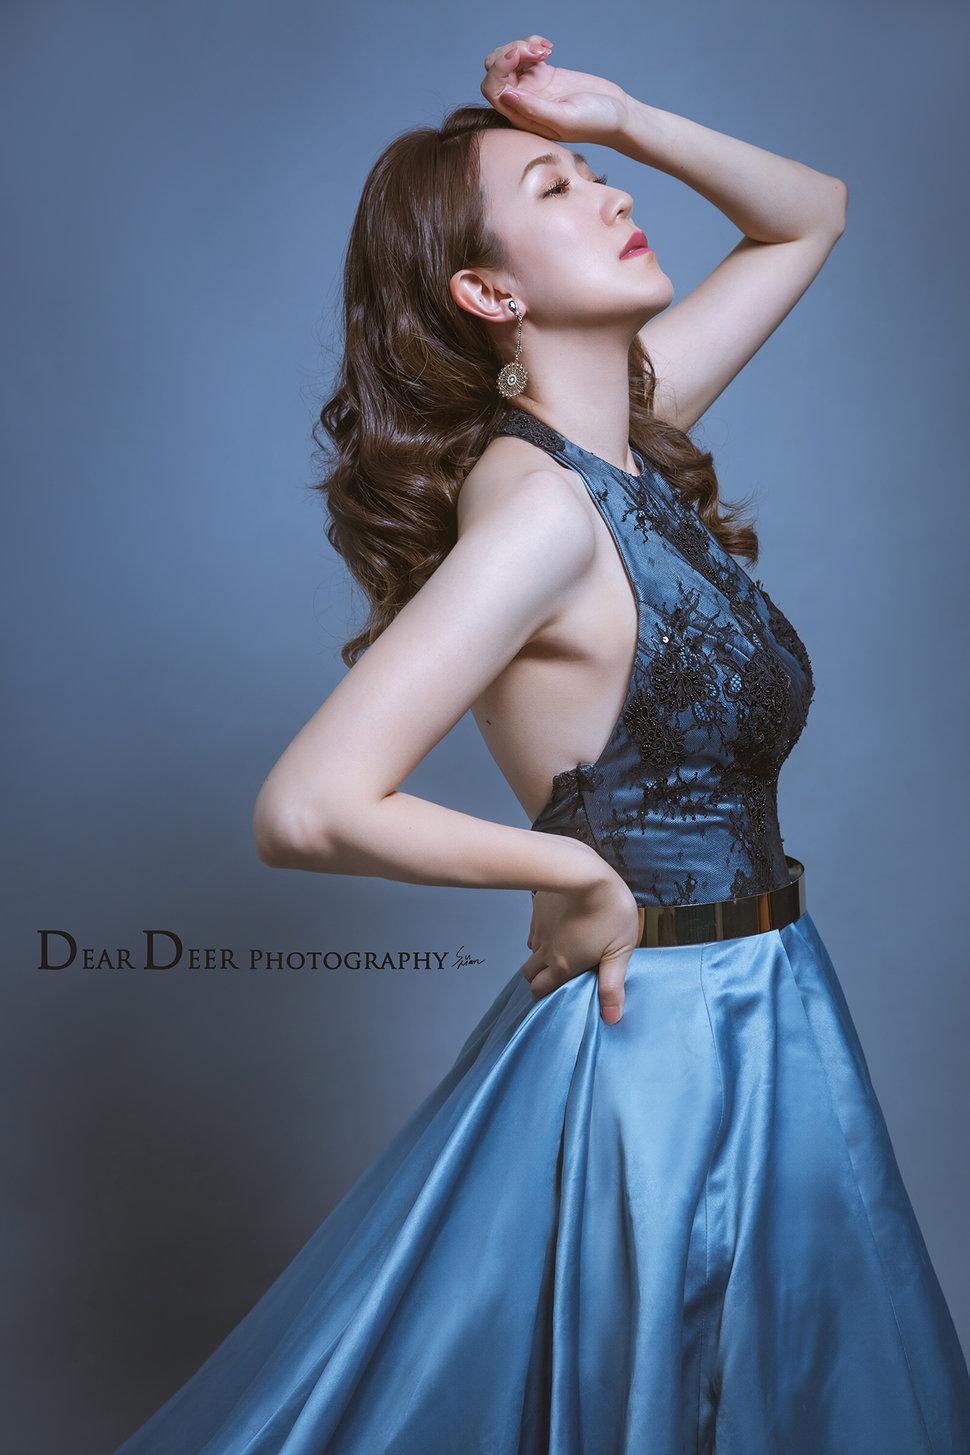 Dear Deer 經典韓系棚拍(編號:2403855) - Dear Deer鹿兒攝影 女攝影師蘇蔓 - 結婚吧